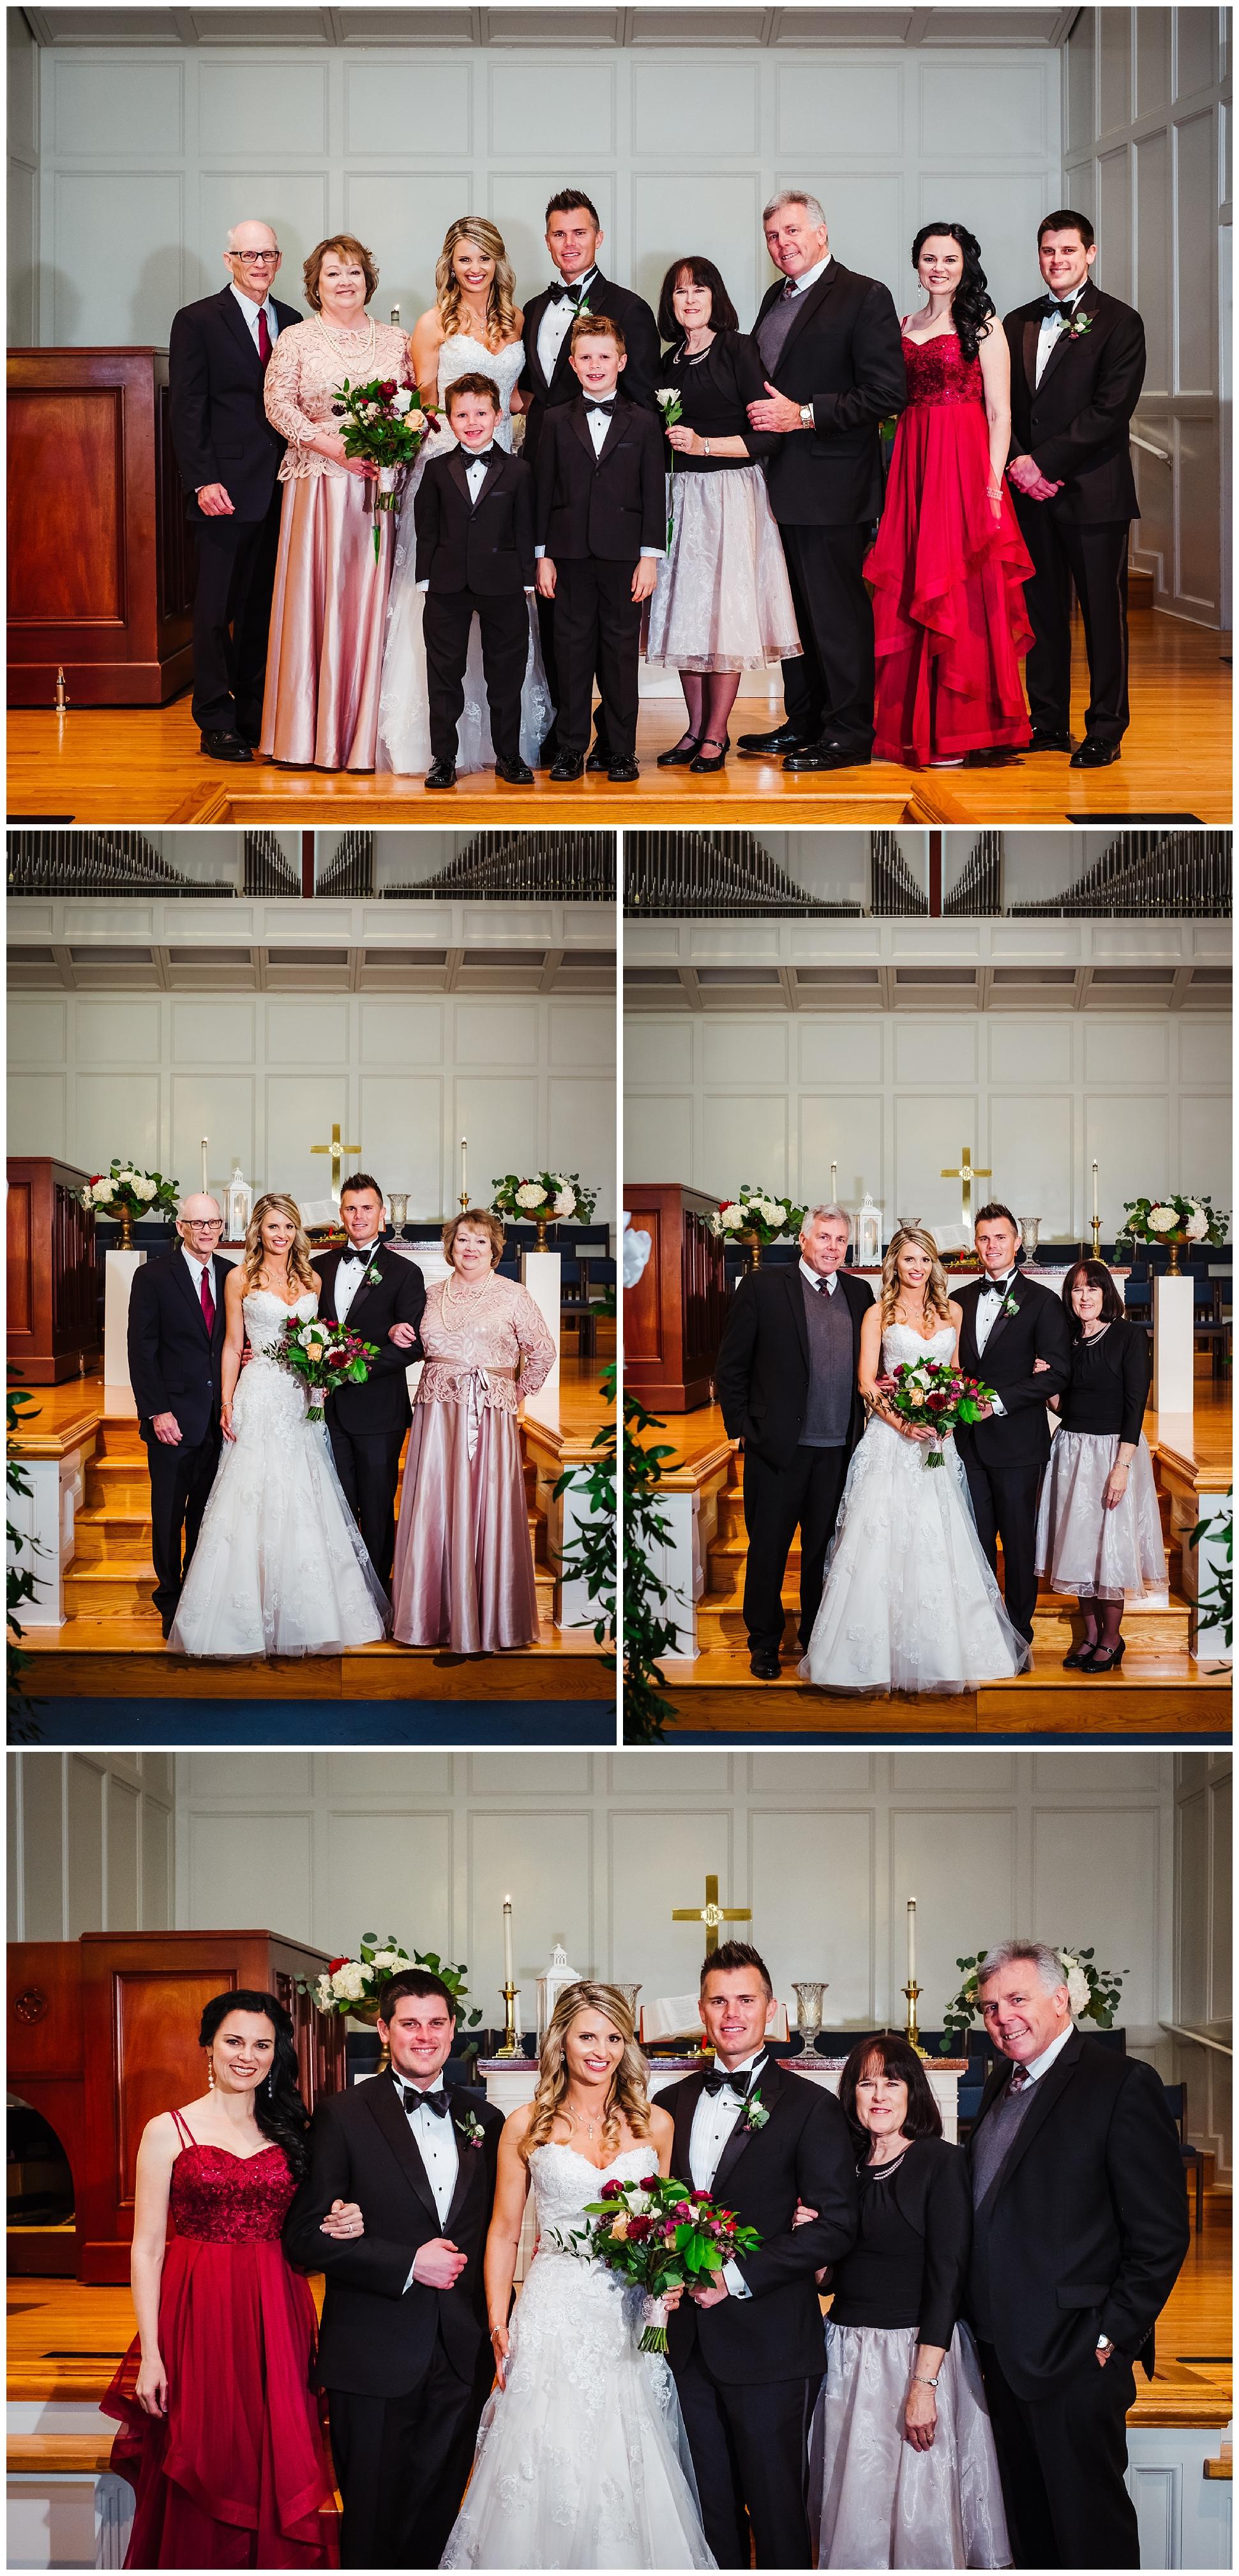 tampa-bradenton-wedding-photographer-south-florida-museum-classic-blush-gold-alpacas-sparklers_0056.jpg